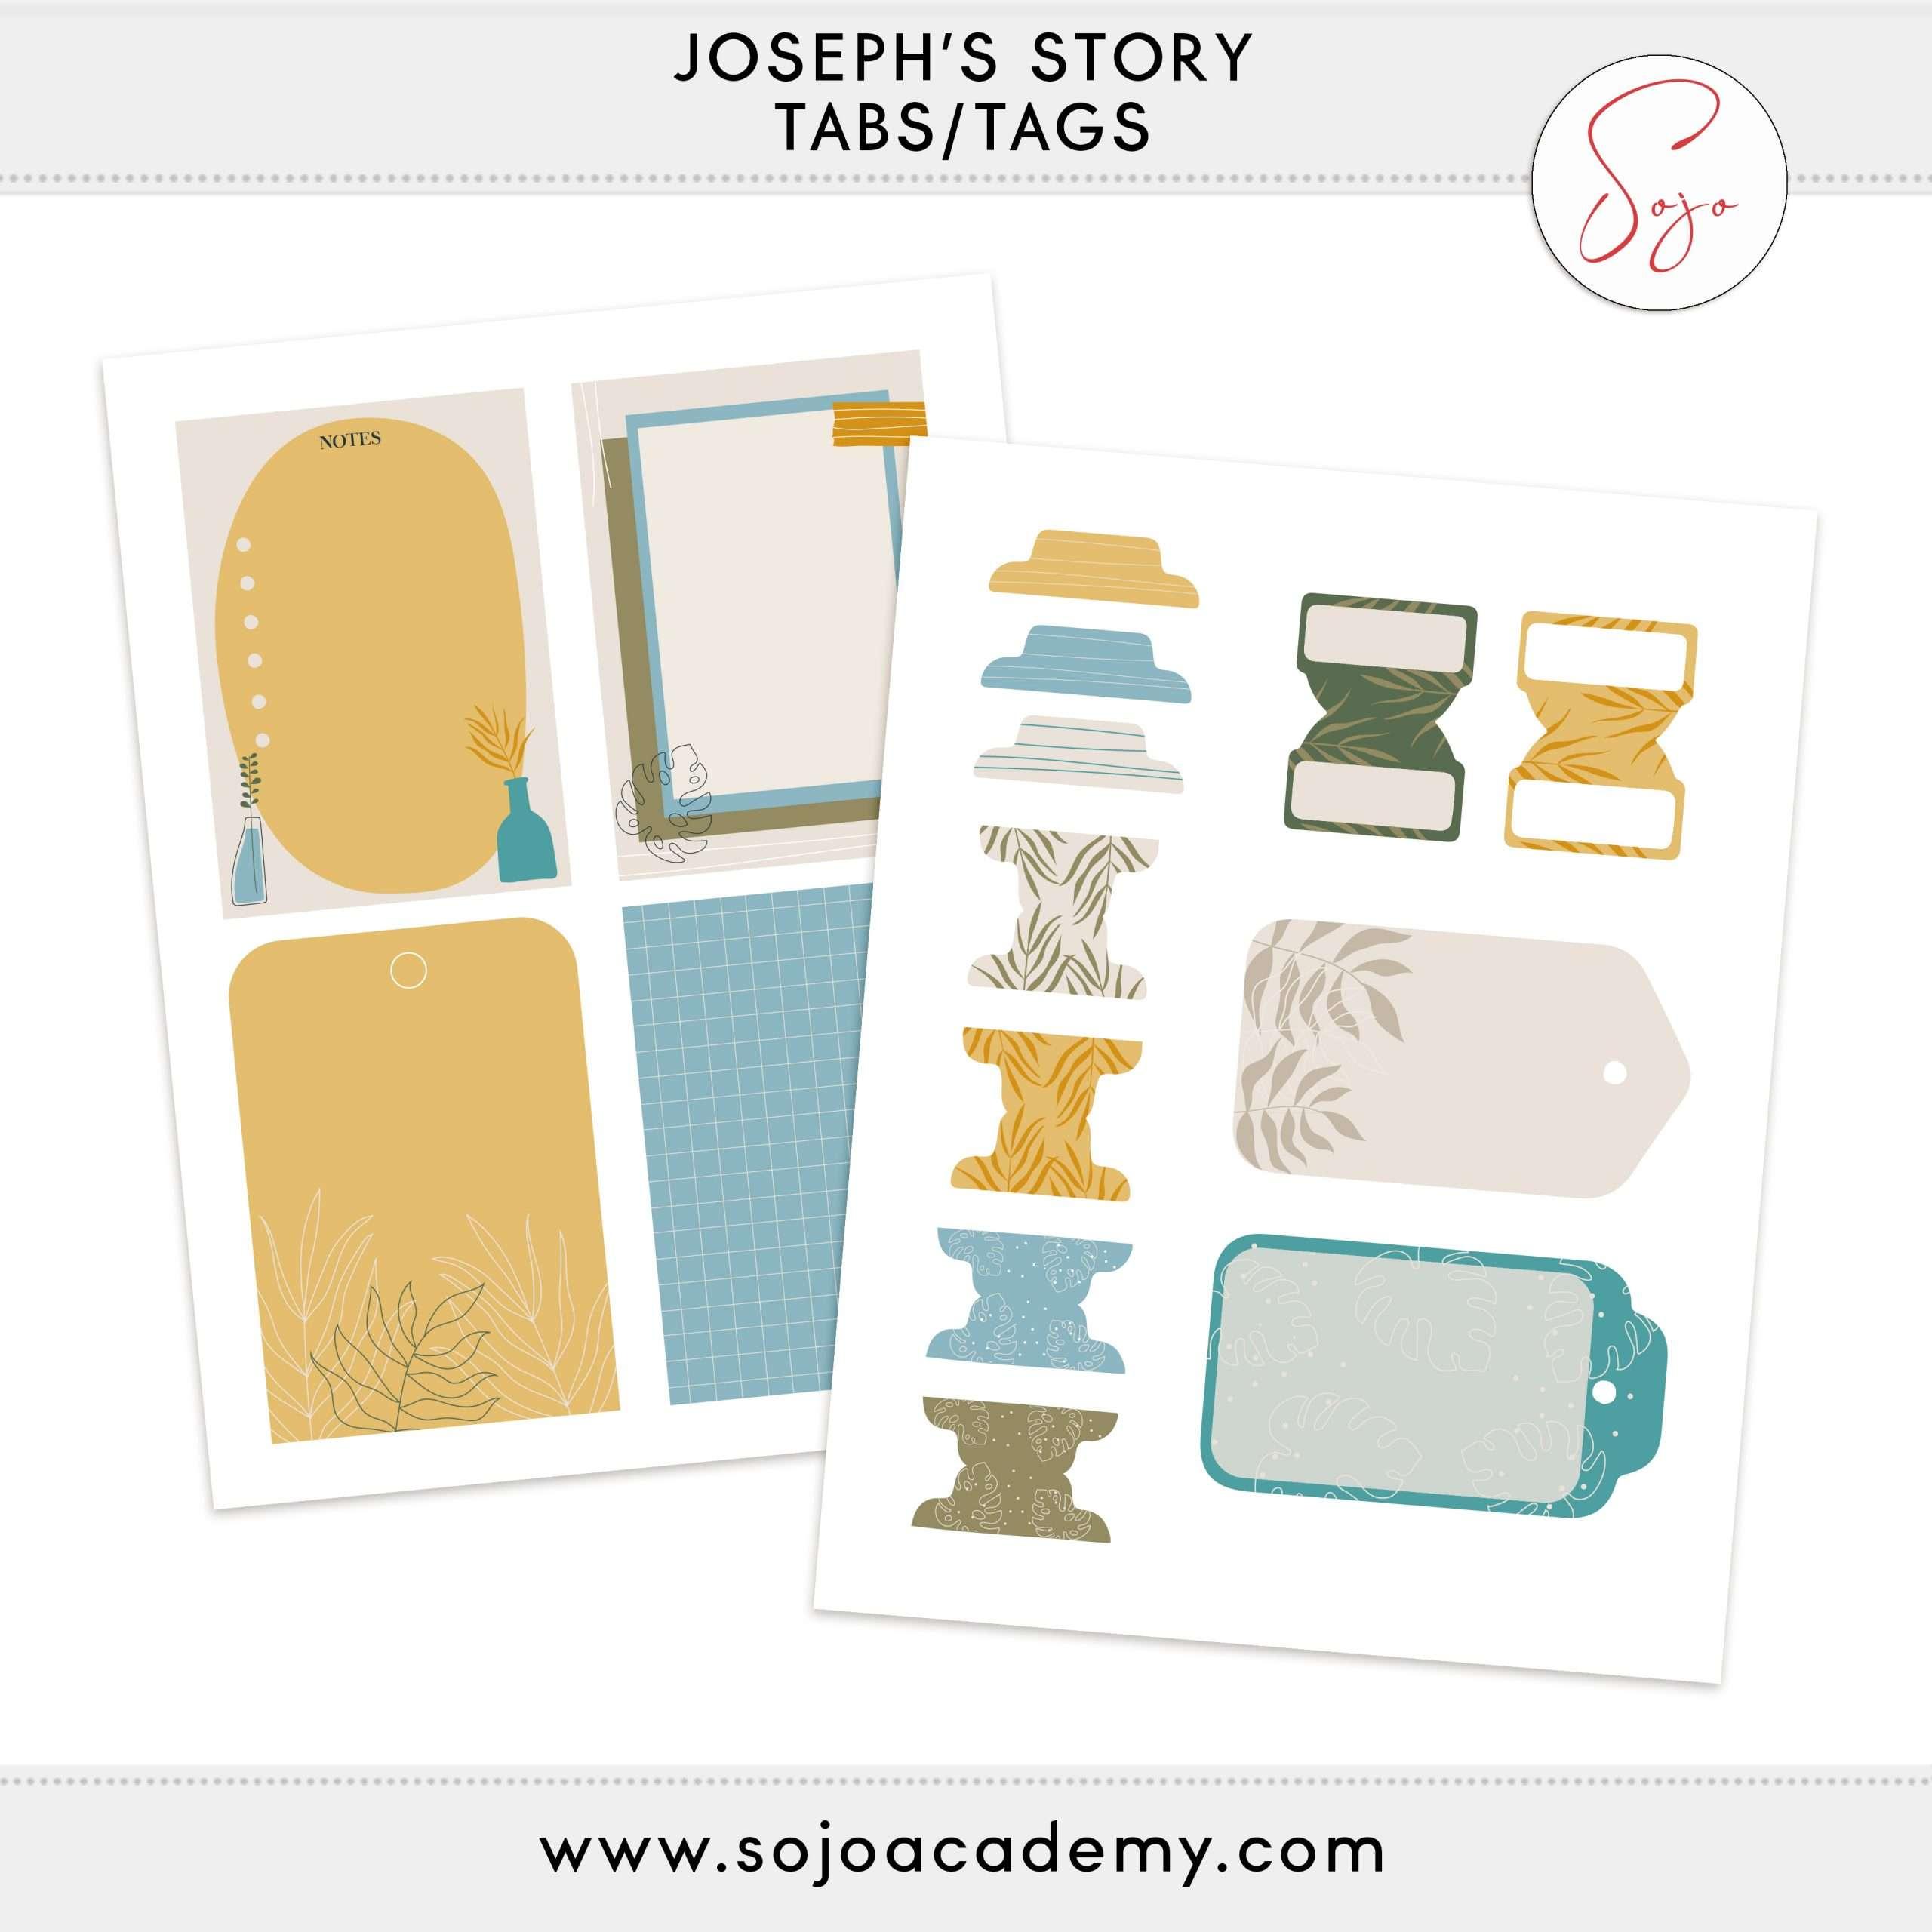 Sojo_November_JosephsStory_Preview_TabsTags